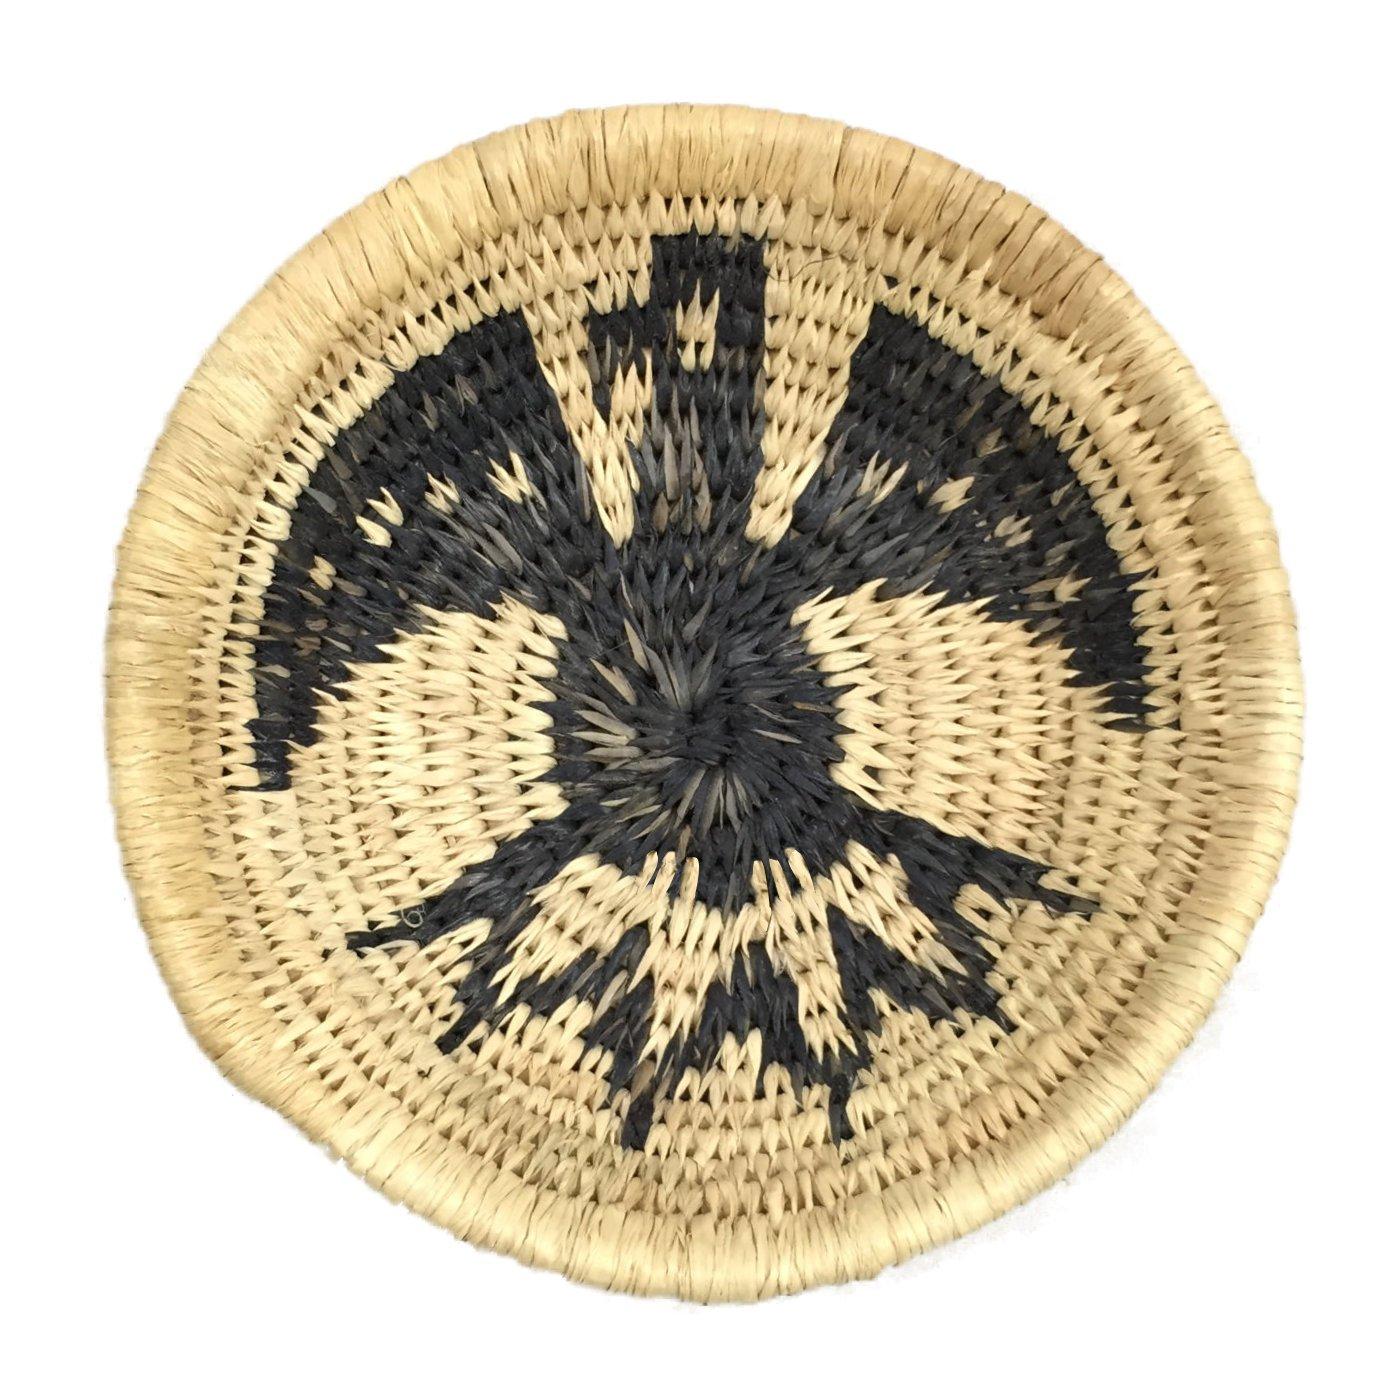 Coiled Basket Kit - Eagle Design Traditional Craft Kits CBEA